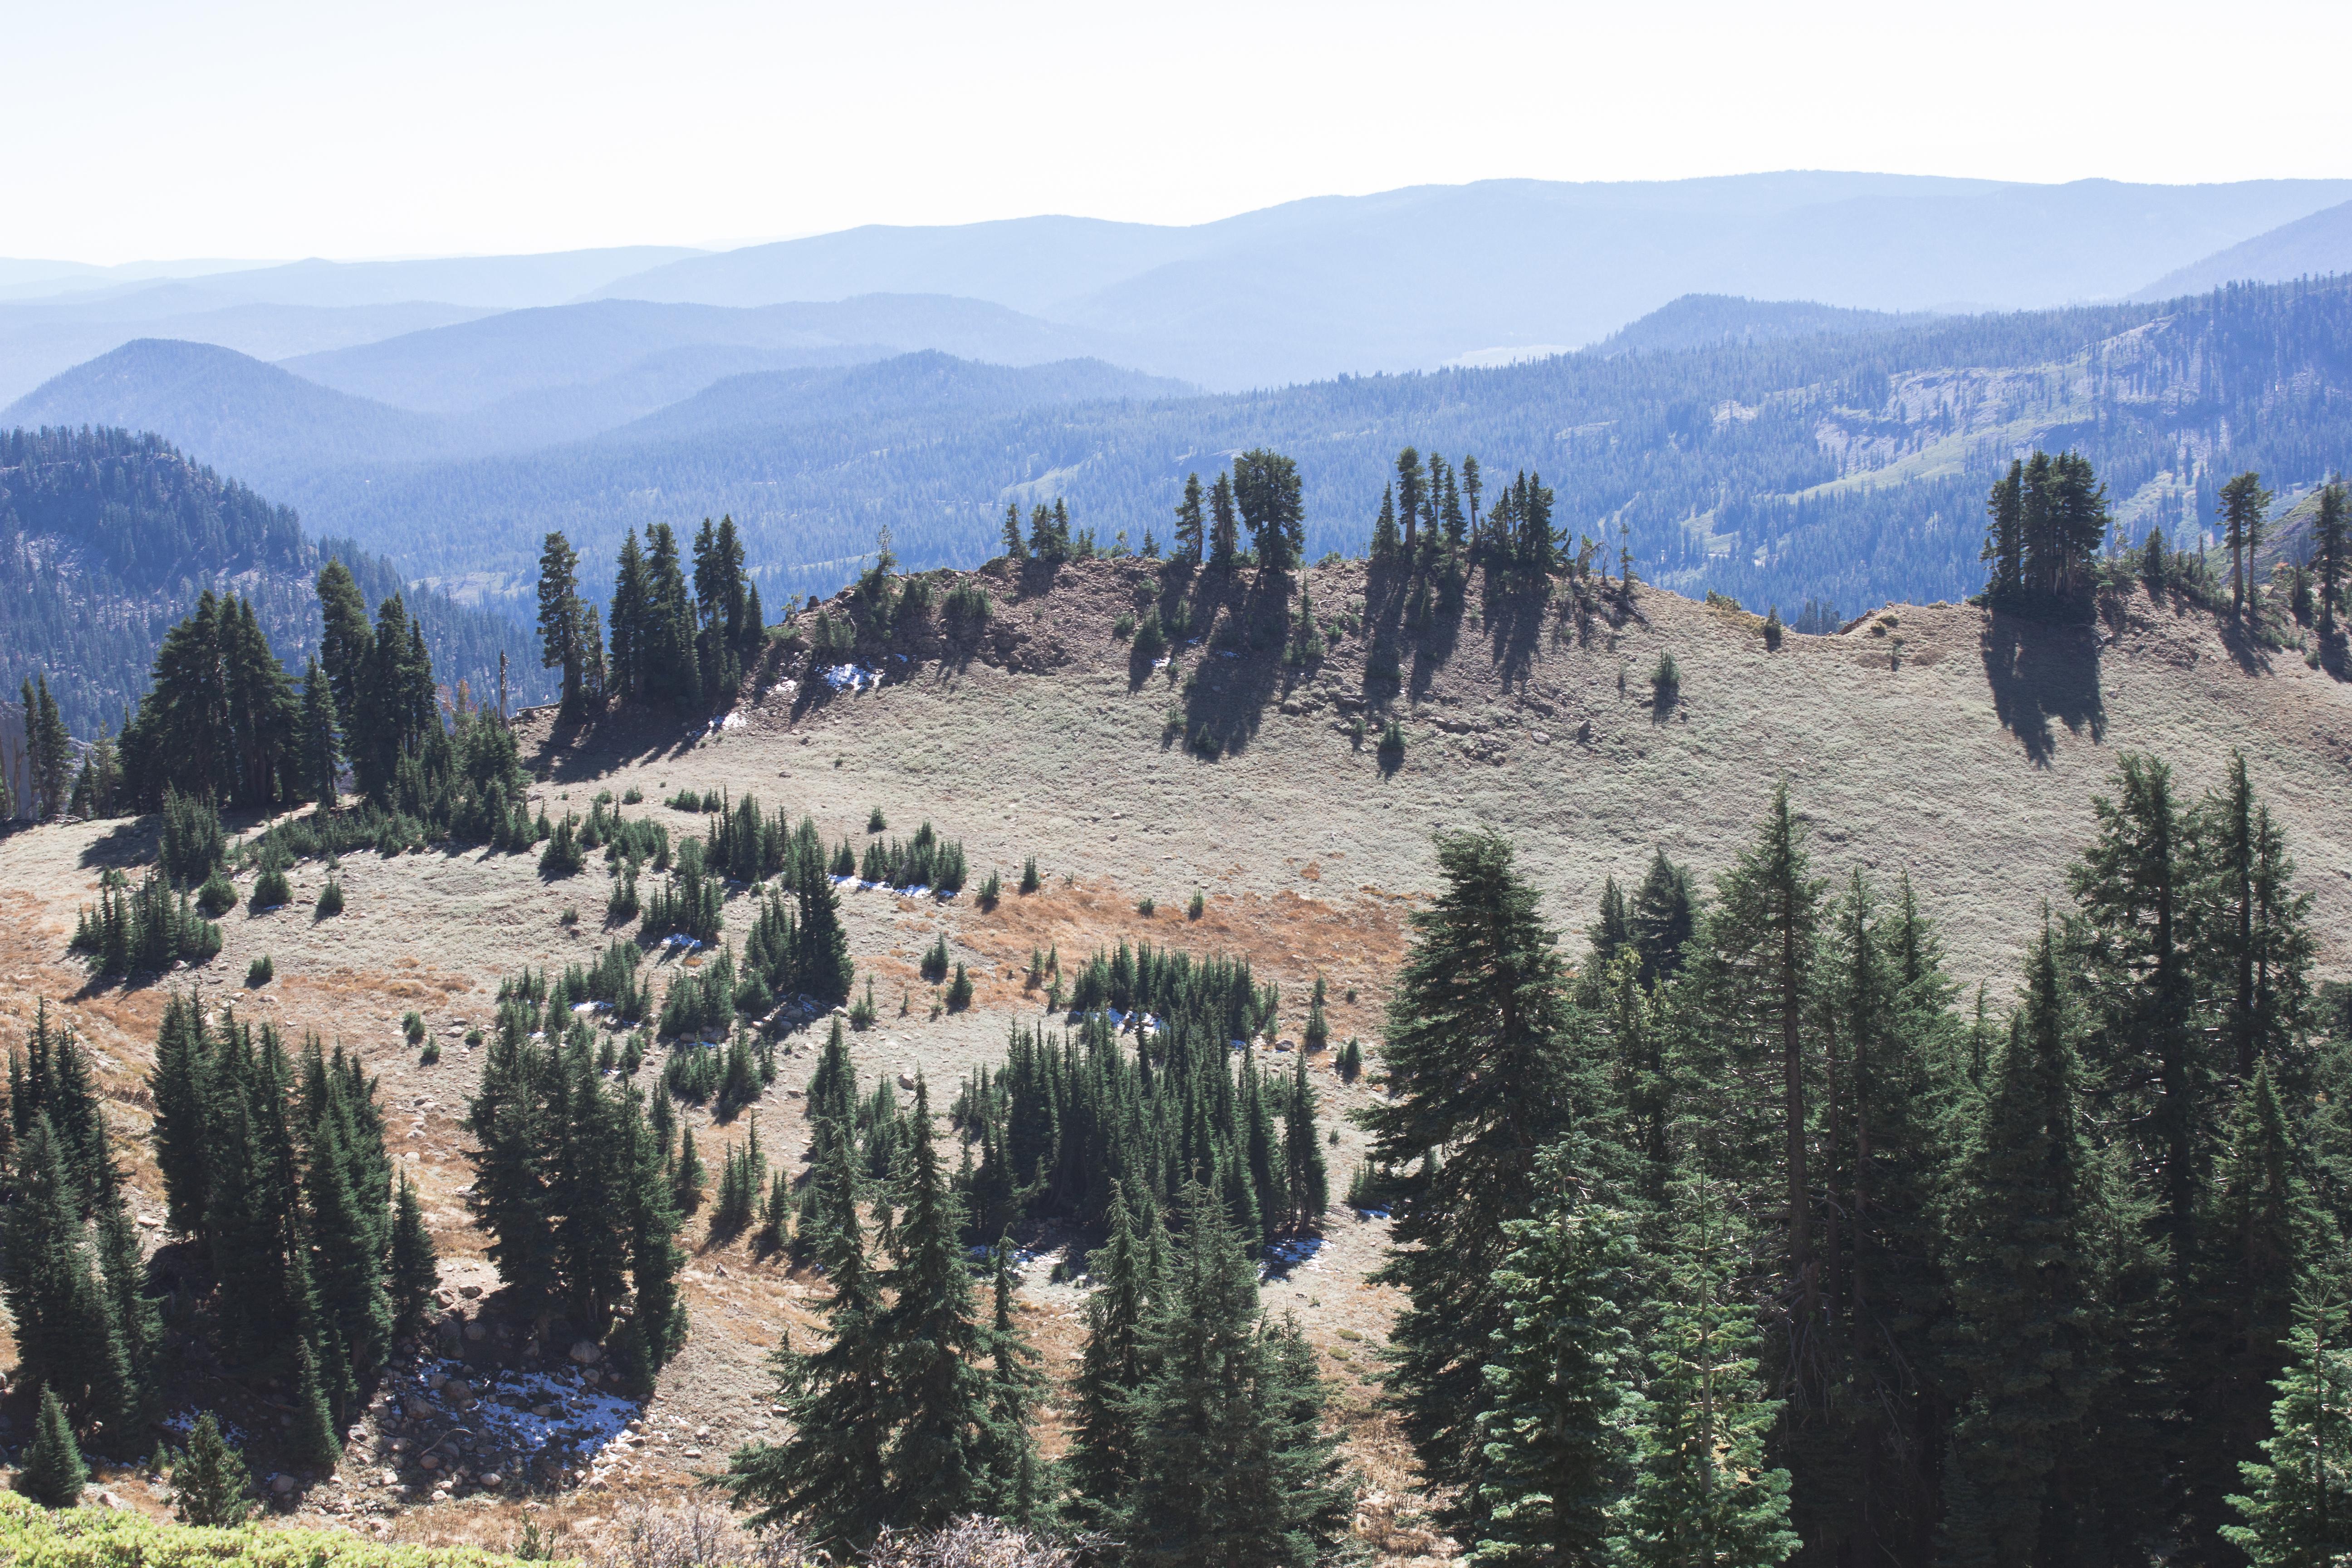 Lassen National Park in California